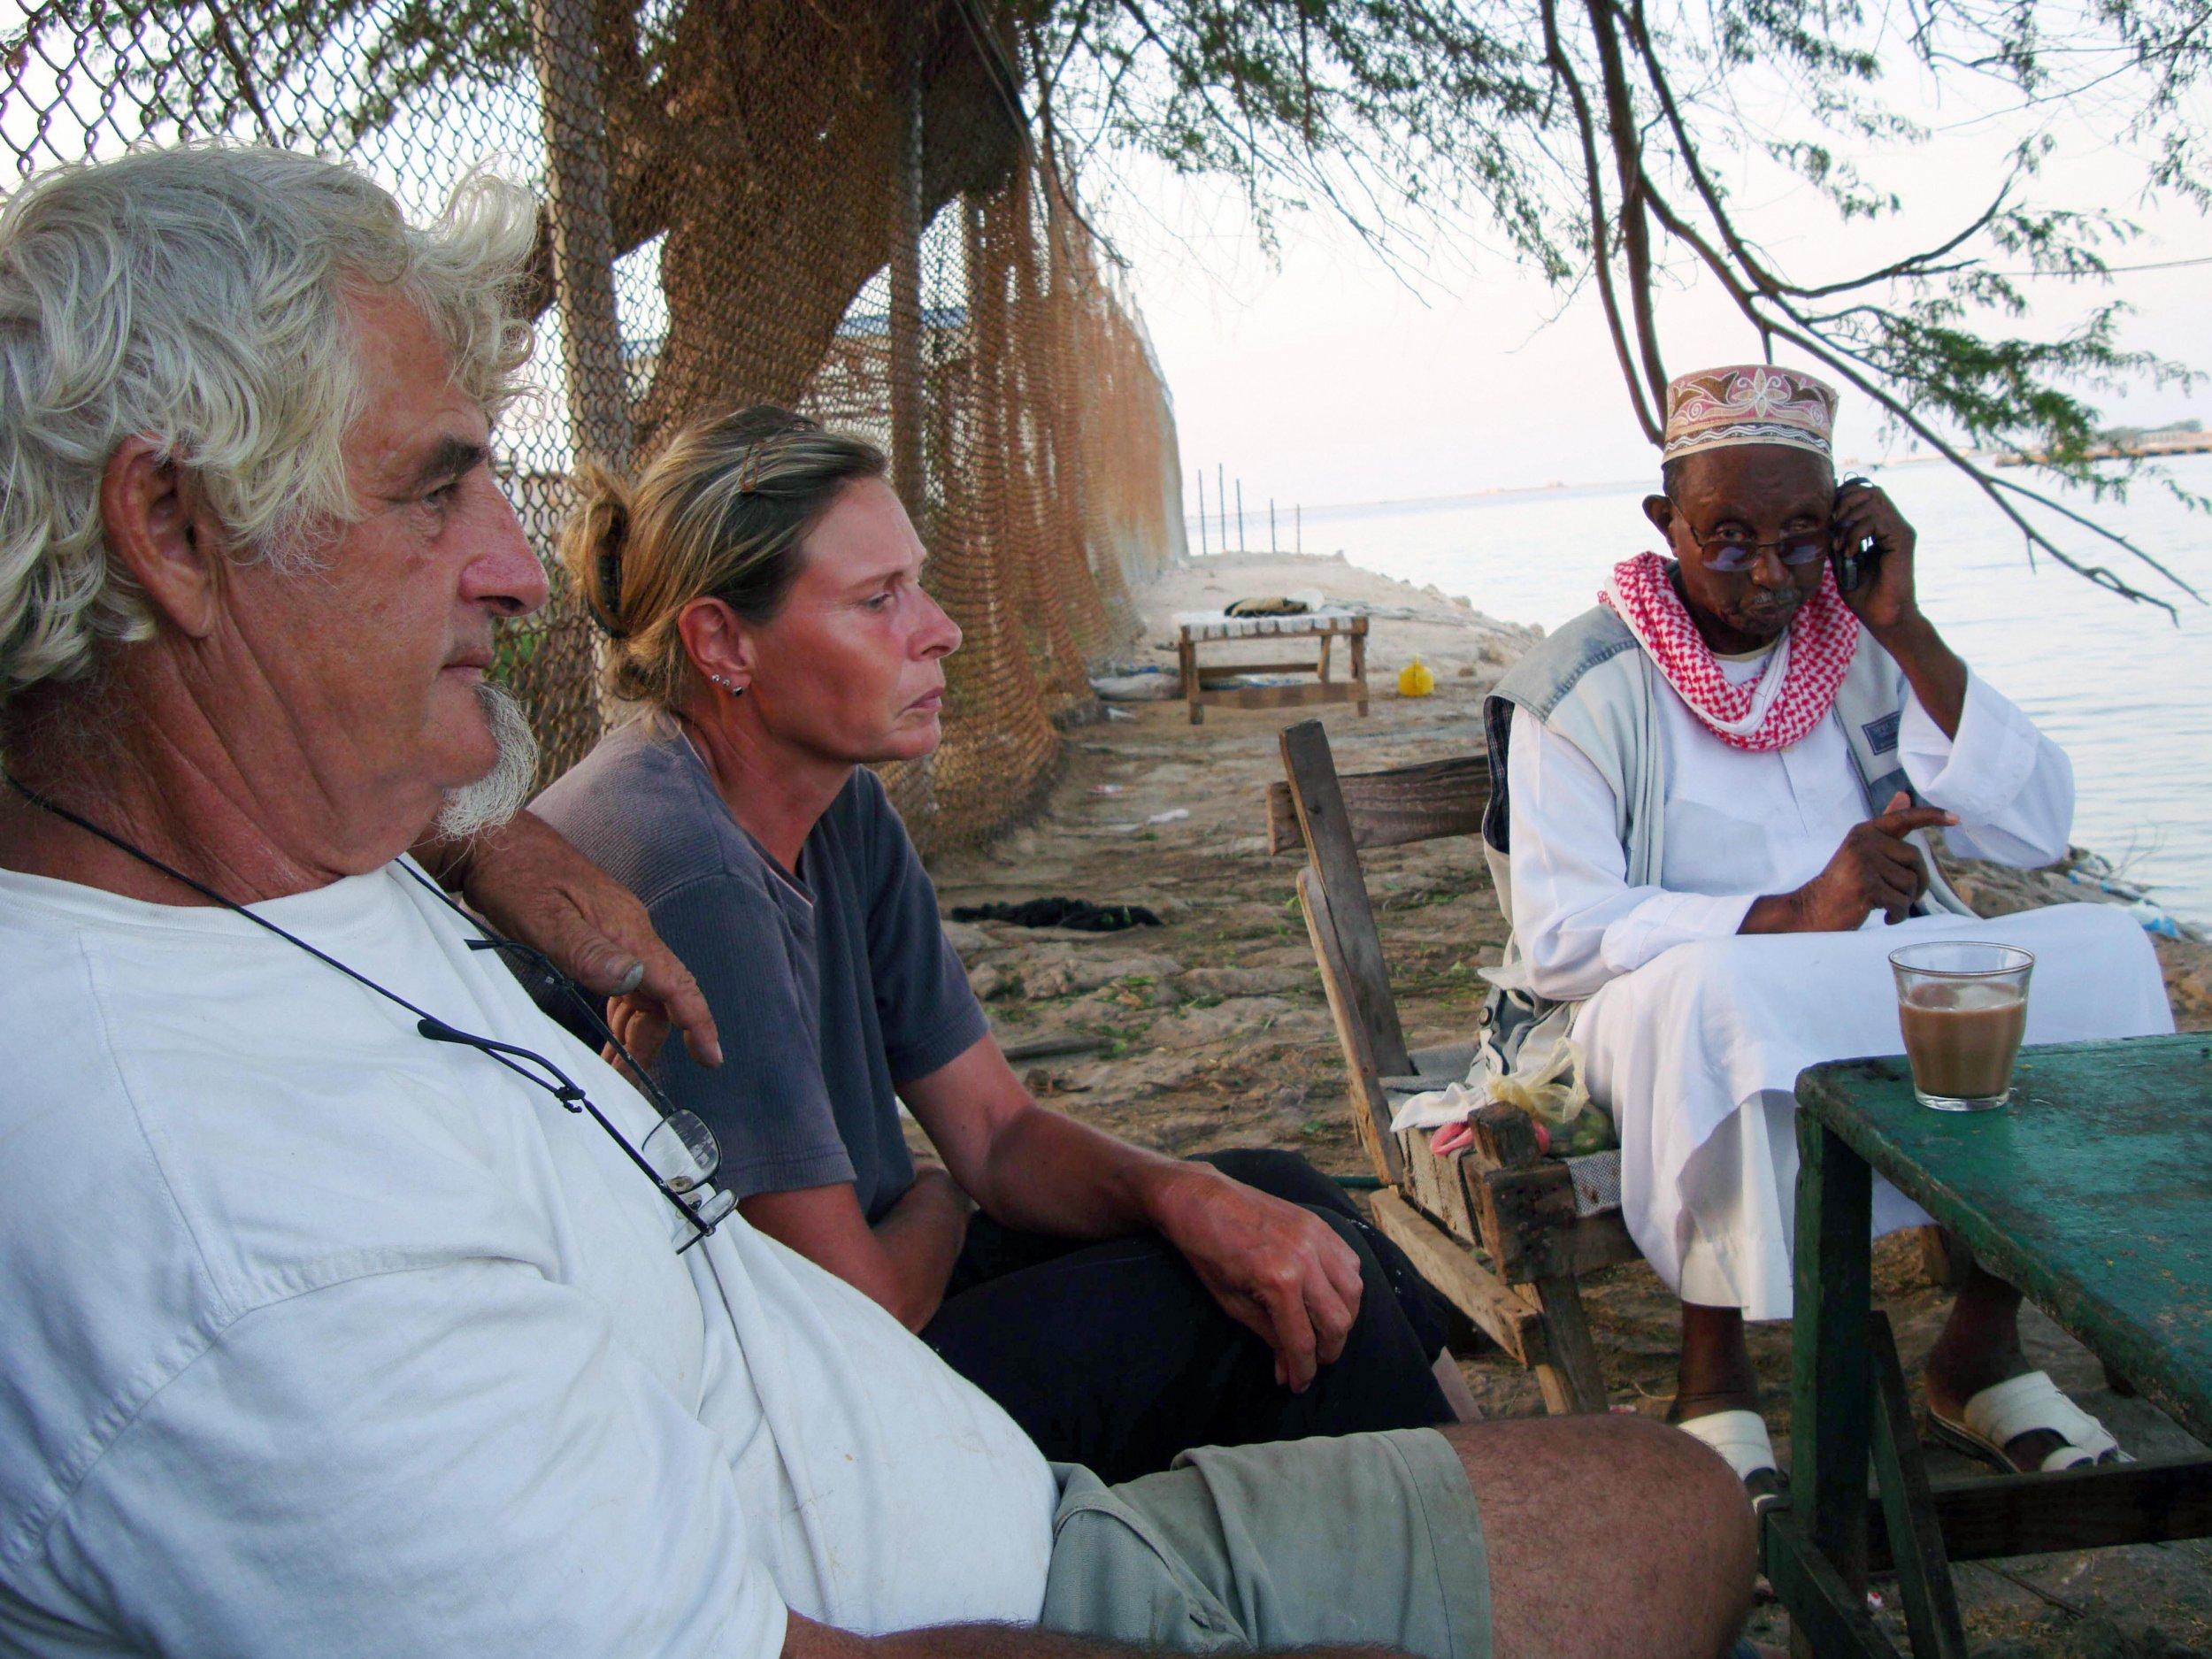 Jurgen Kantner and Sabine Merz in Somalia